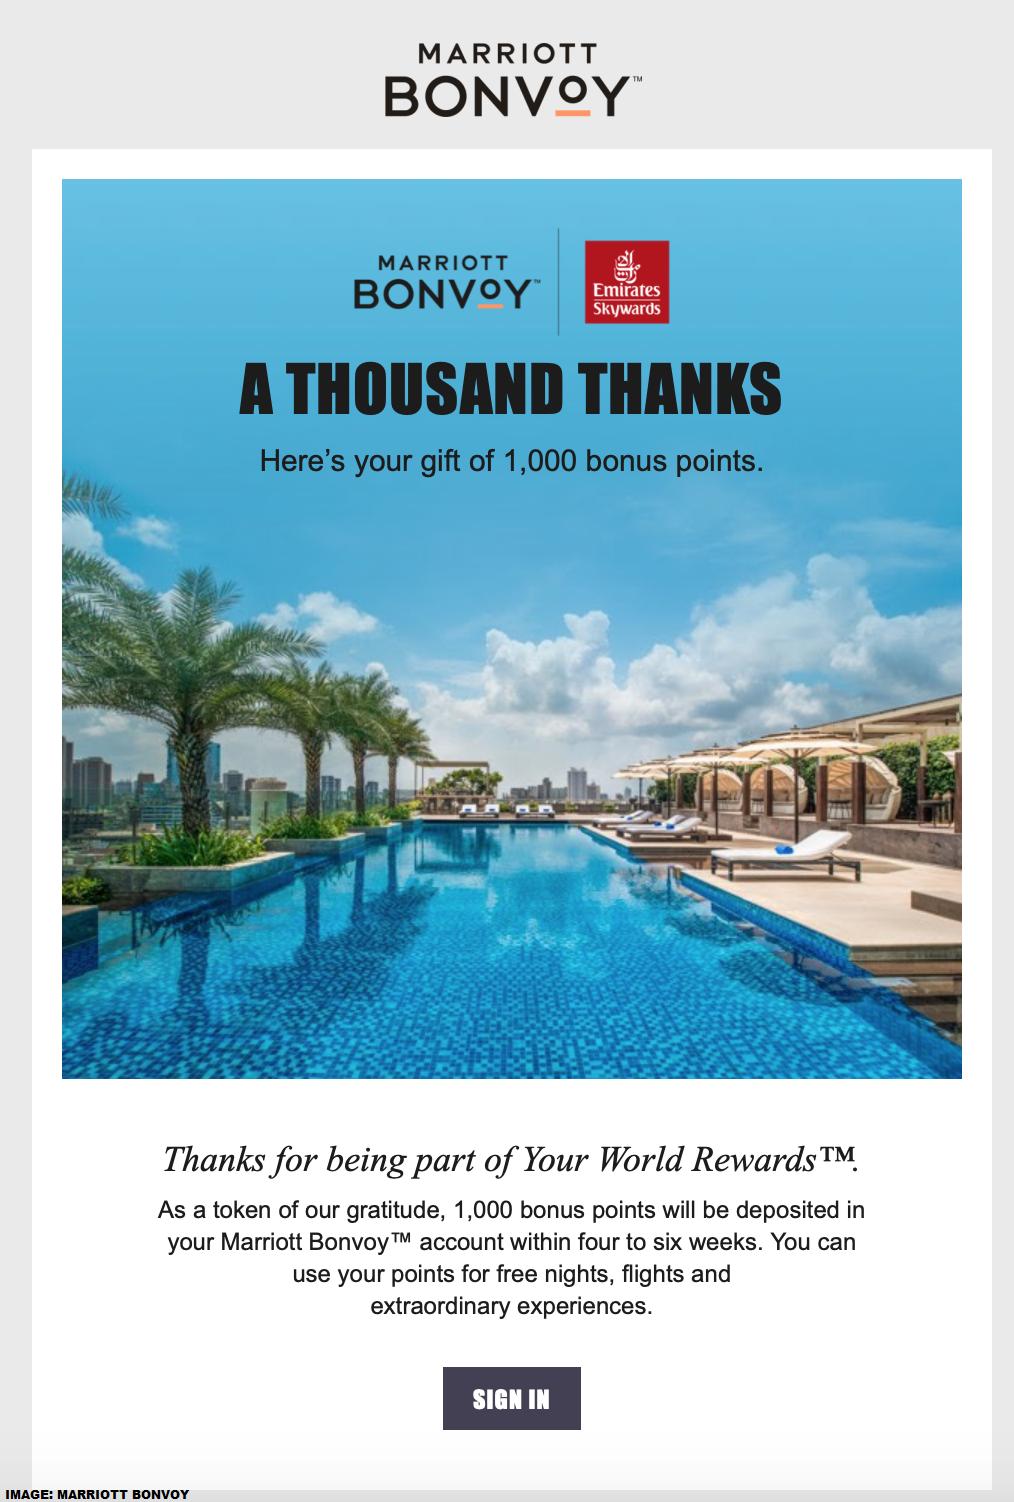 Marriott Bonvoy Emirates Your World Rewards